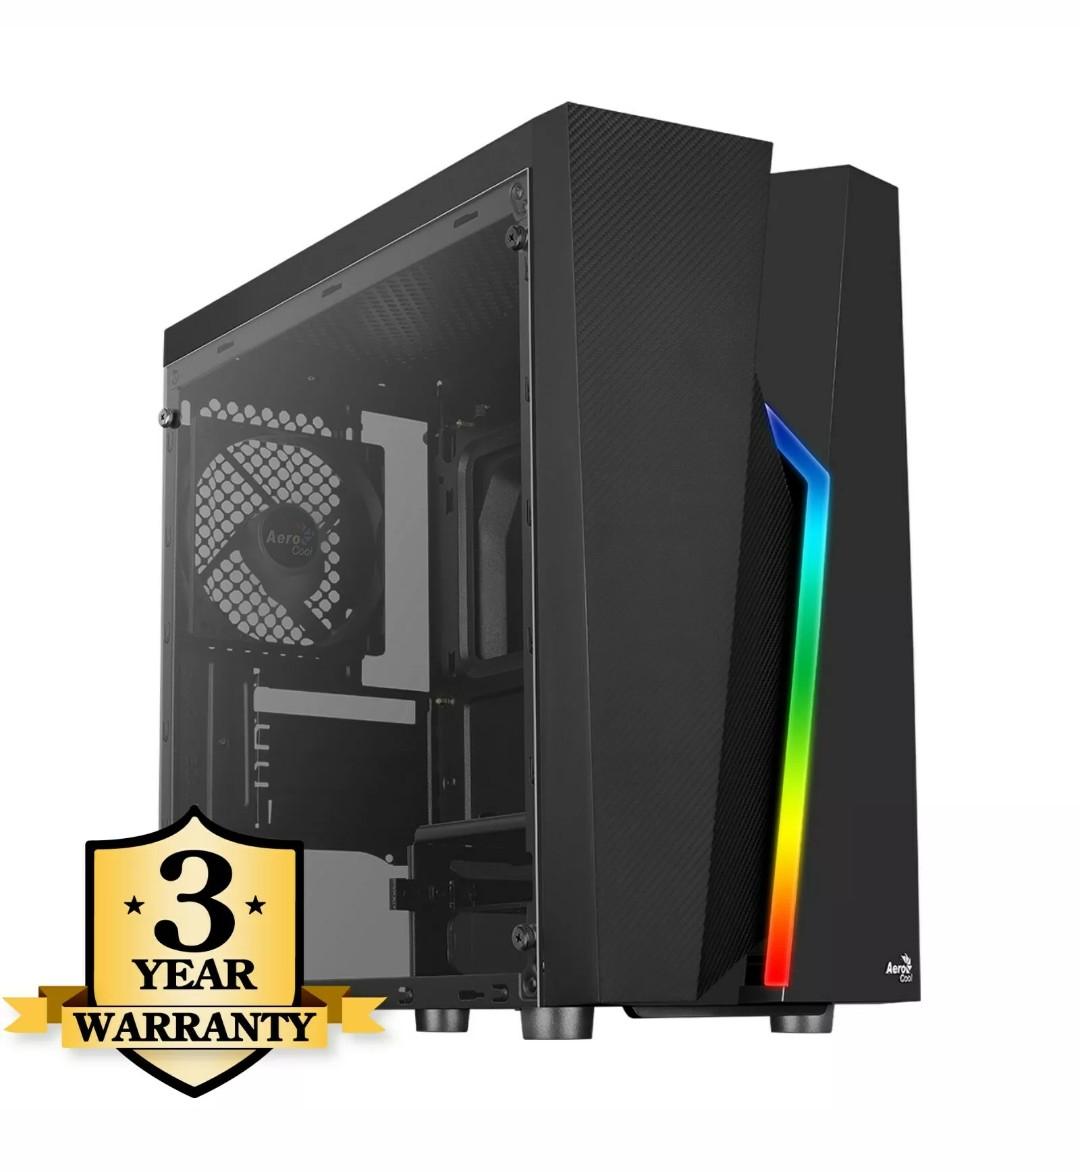 CCL Speedy 4.3GHz AMD Octa Core Ryzen 7-2700X Desktop PC - 16GB RAM, 8GB RX 590 - £659.99 @ cclcomputers ebay